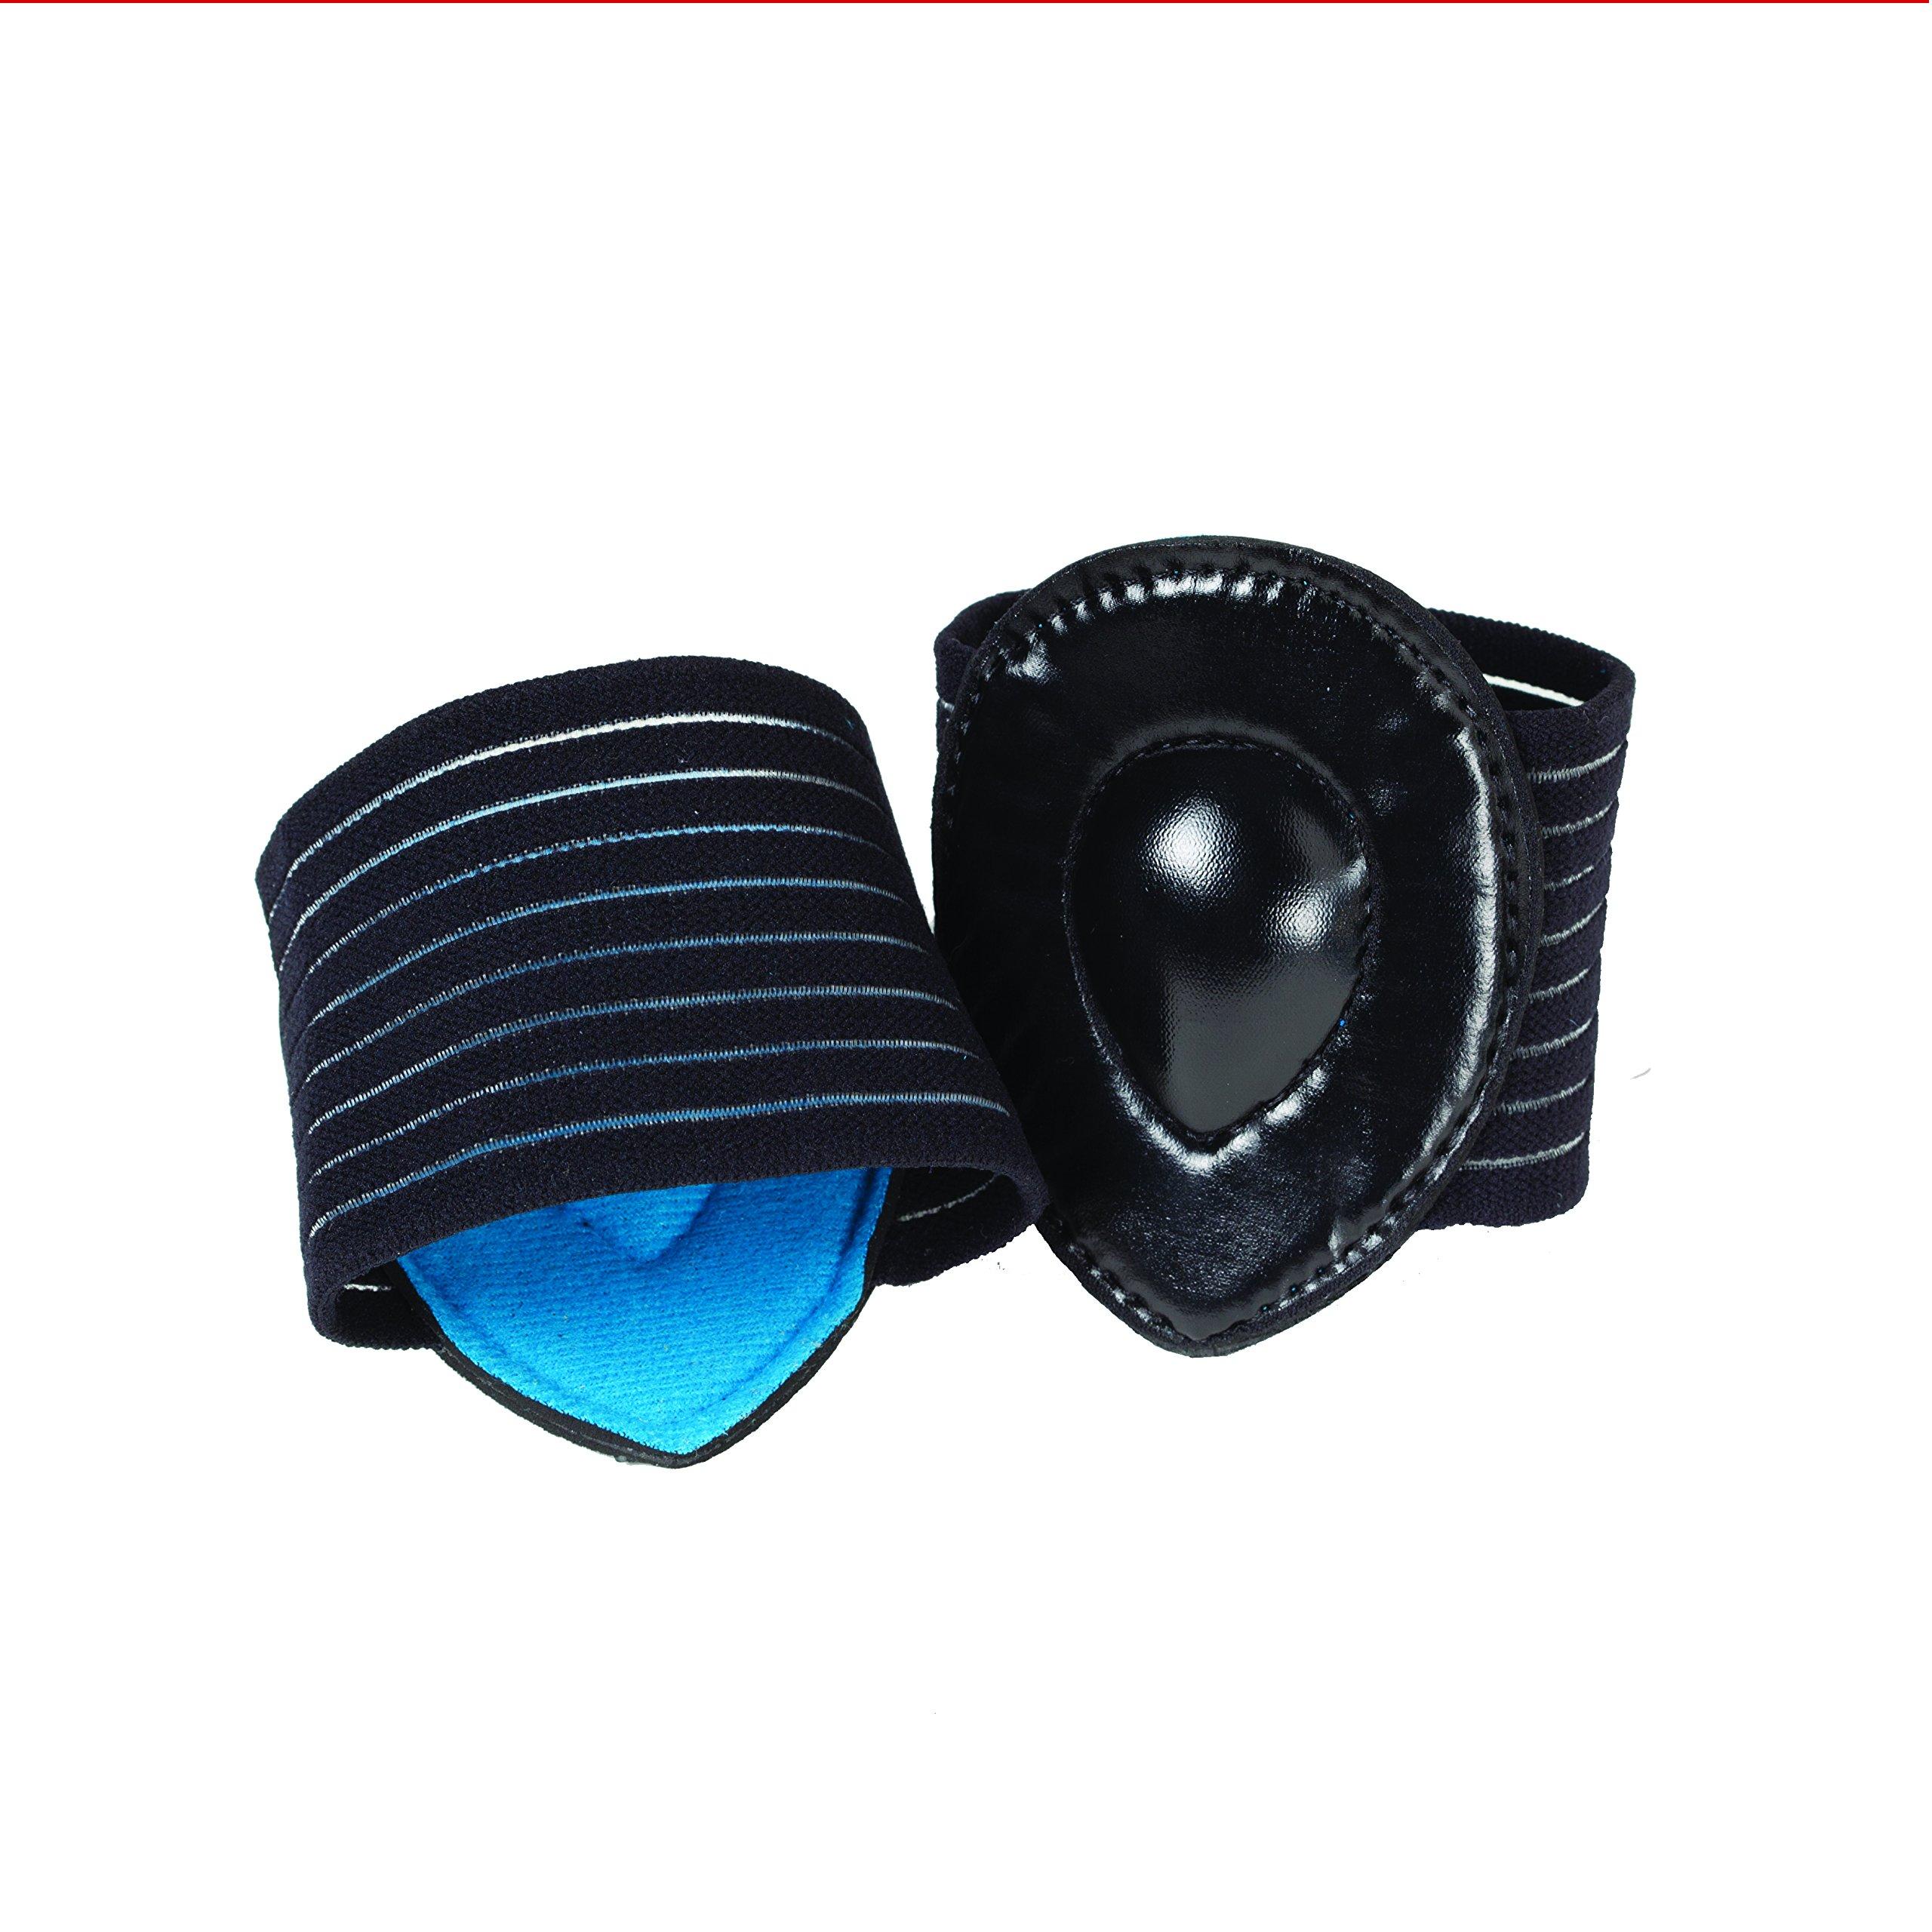 Strutz Pro-Cushioned Arch Supports Black by Strutz